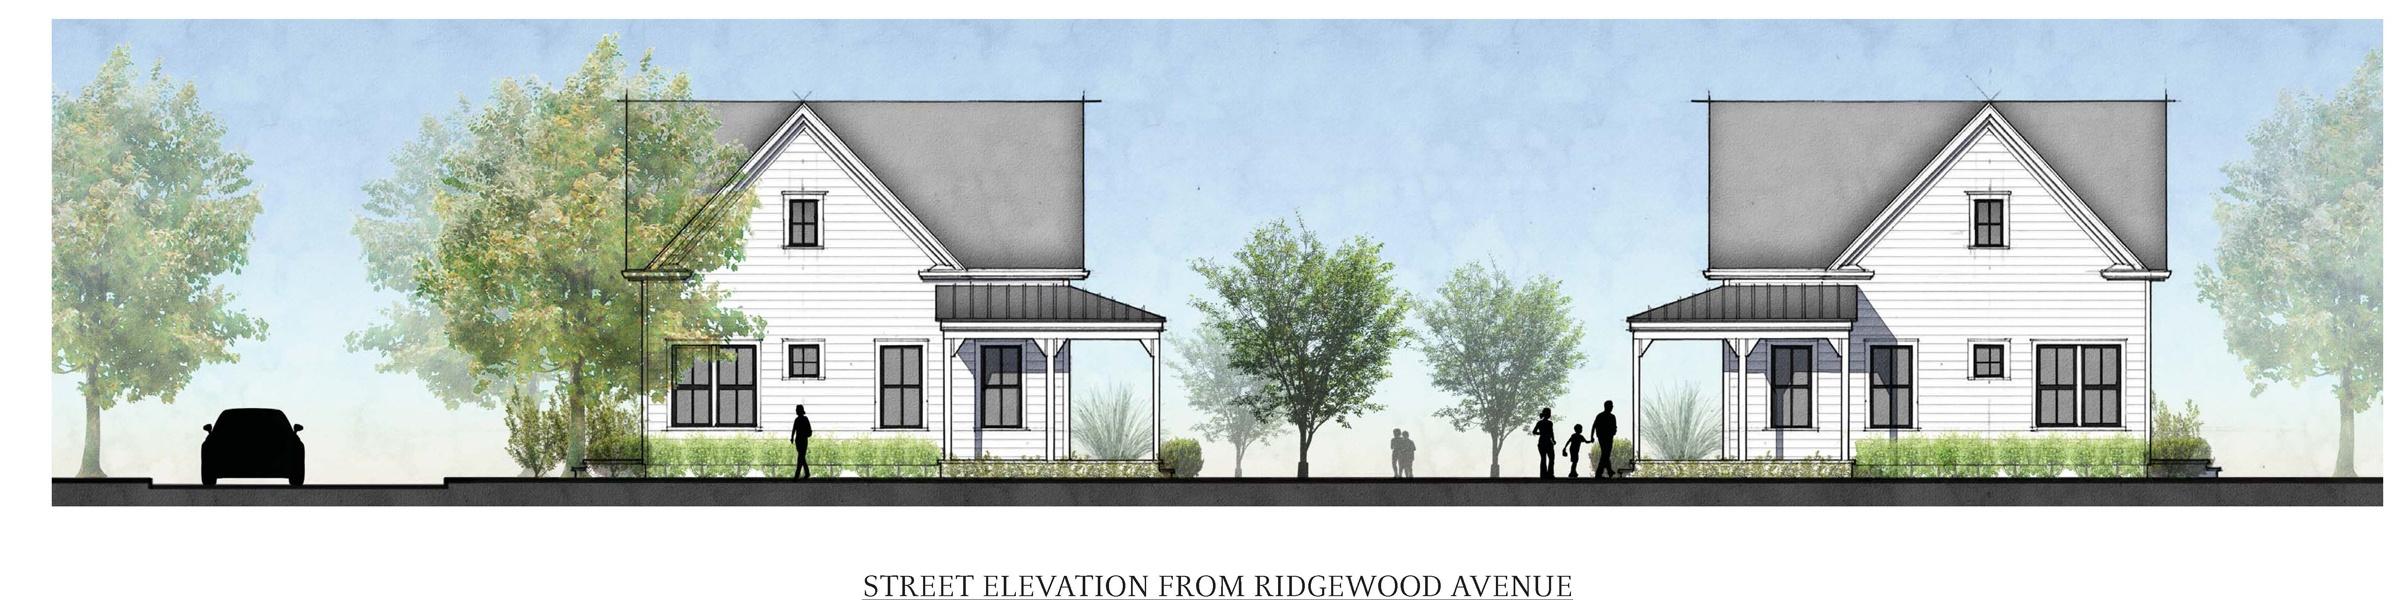 Ridgewood Plans-2 (February 2018).jpg